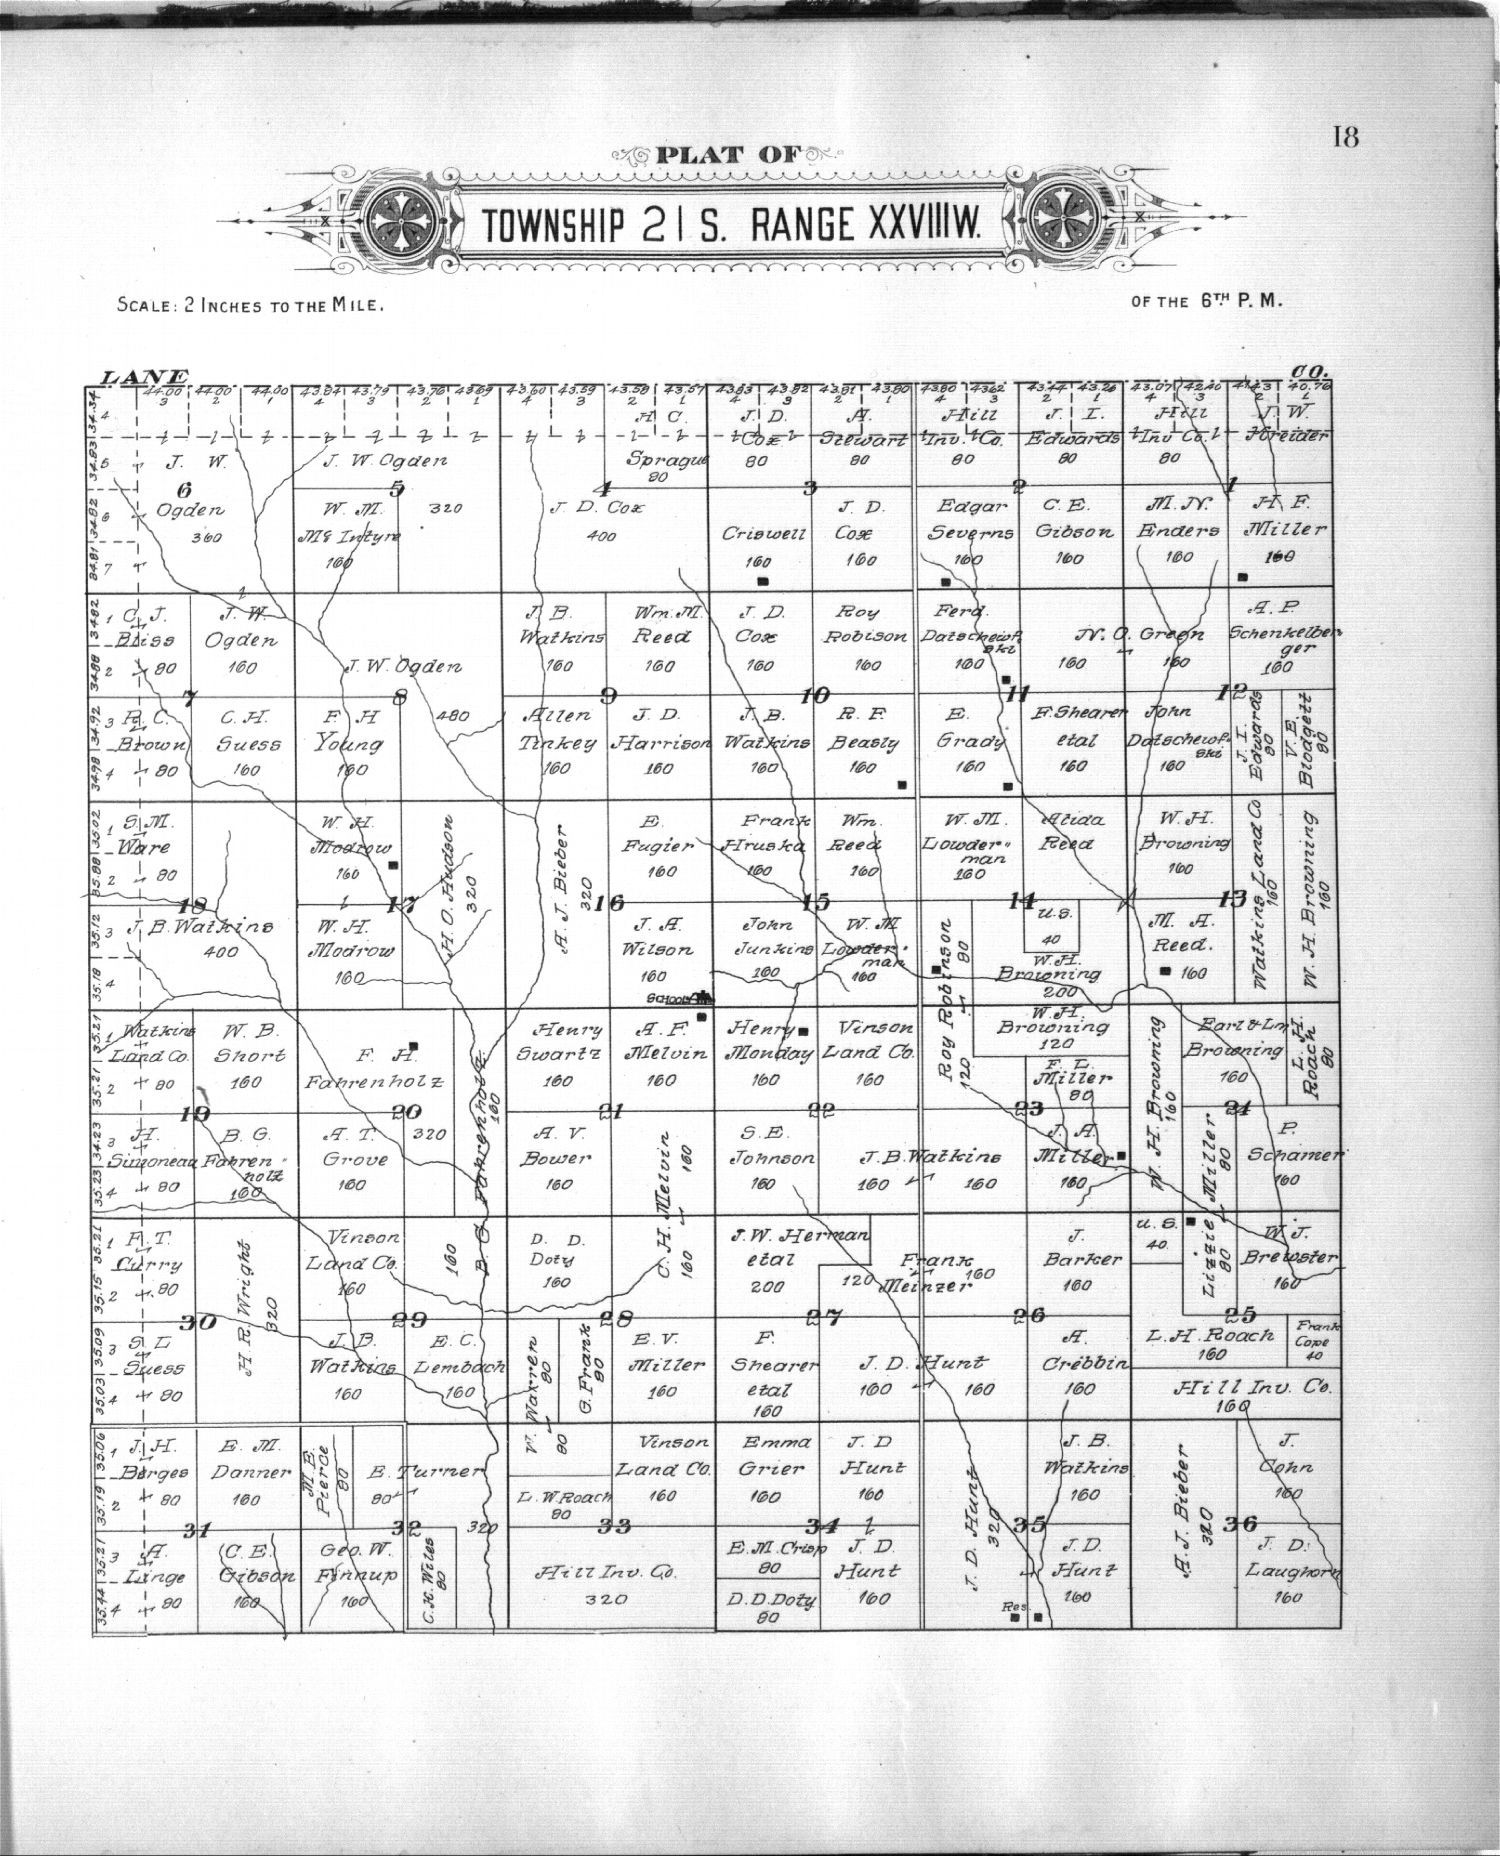 Plat book of Finney County, Kansas - 9